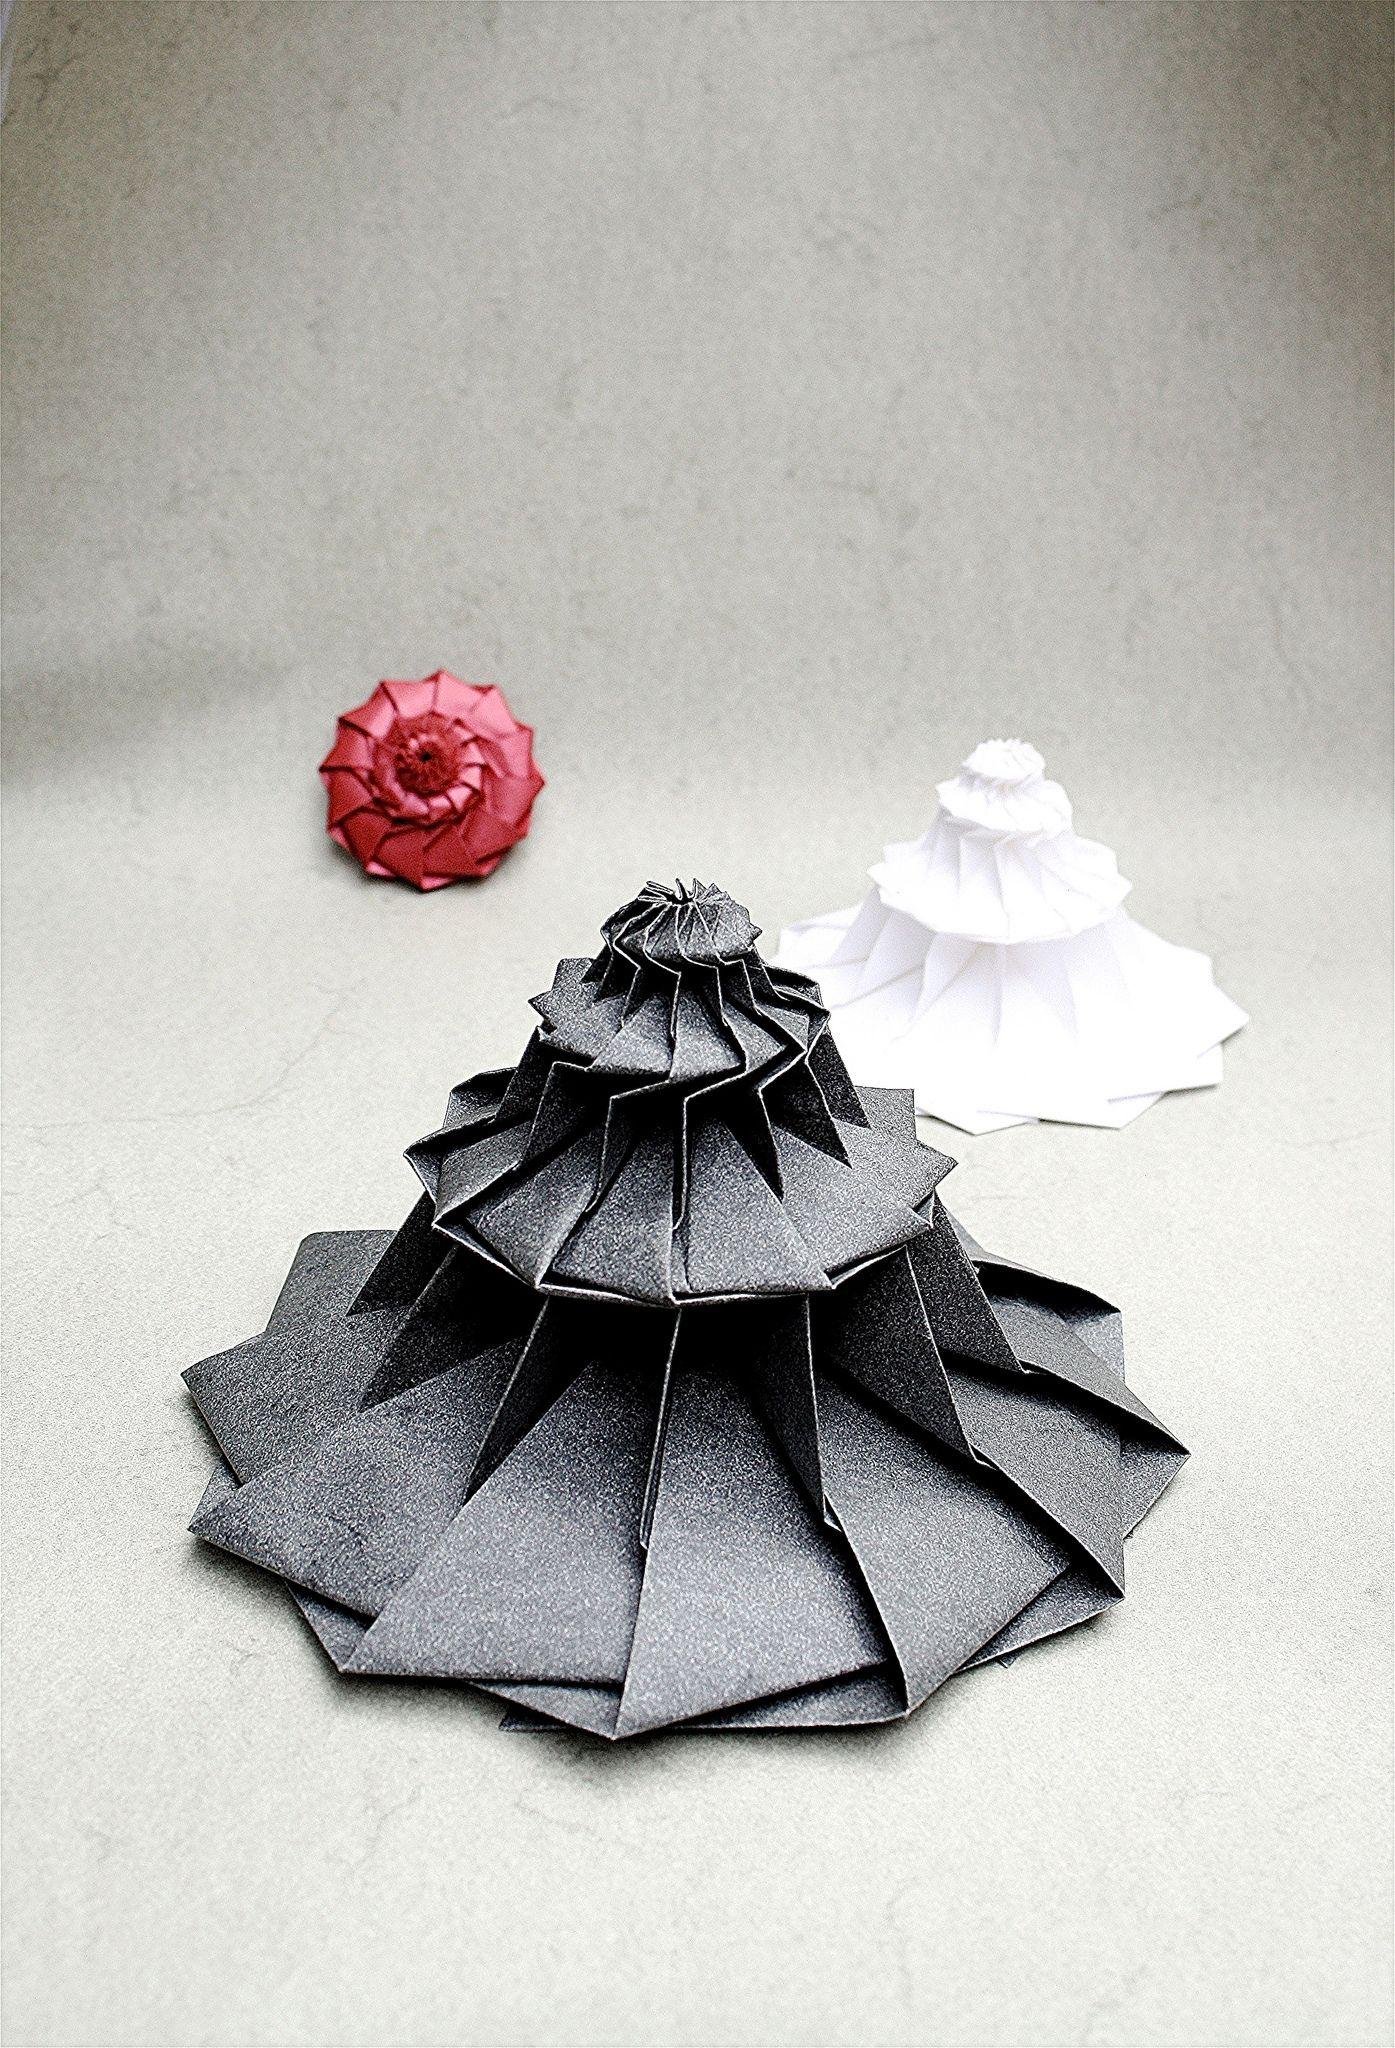 Flower towers origami pinterest flower tower origami and craft origami flower towers mightylinksfo